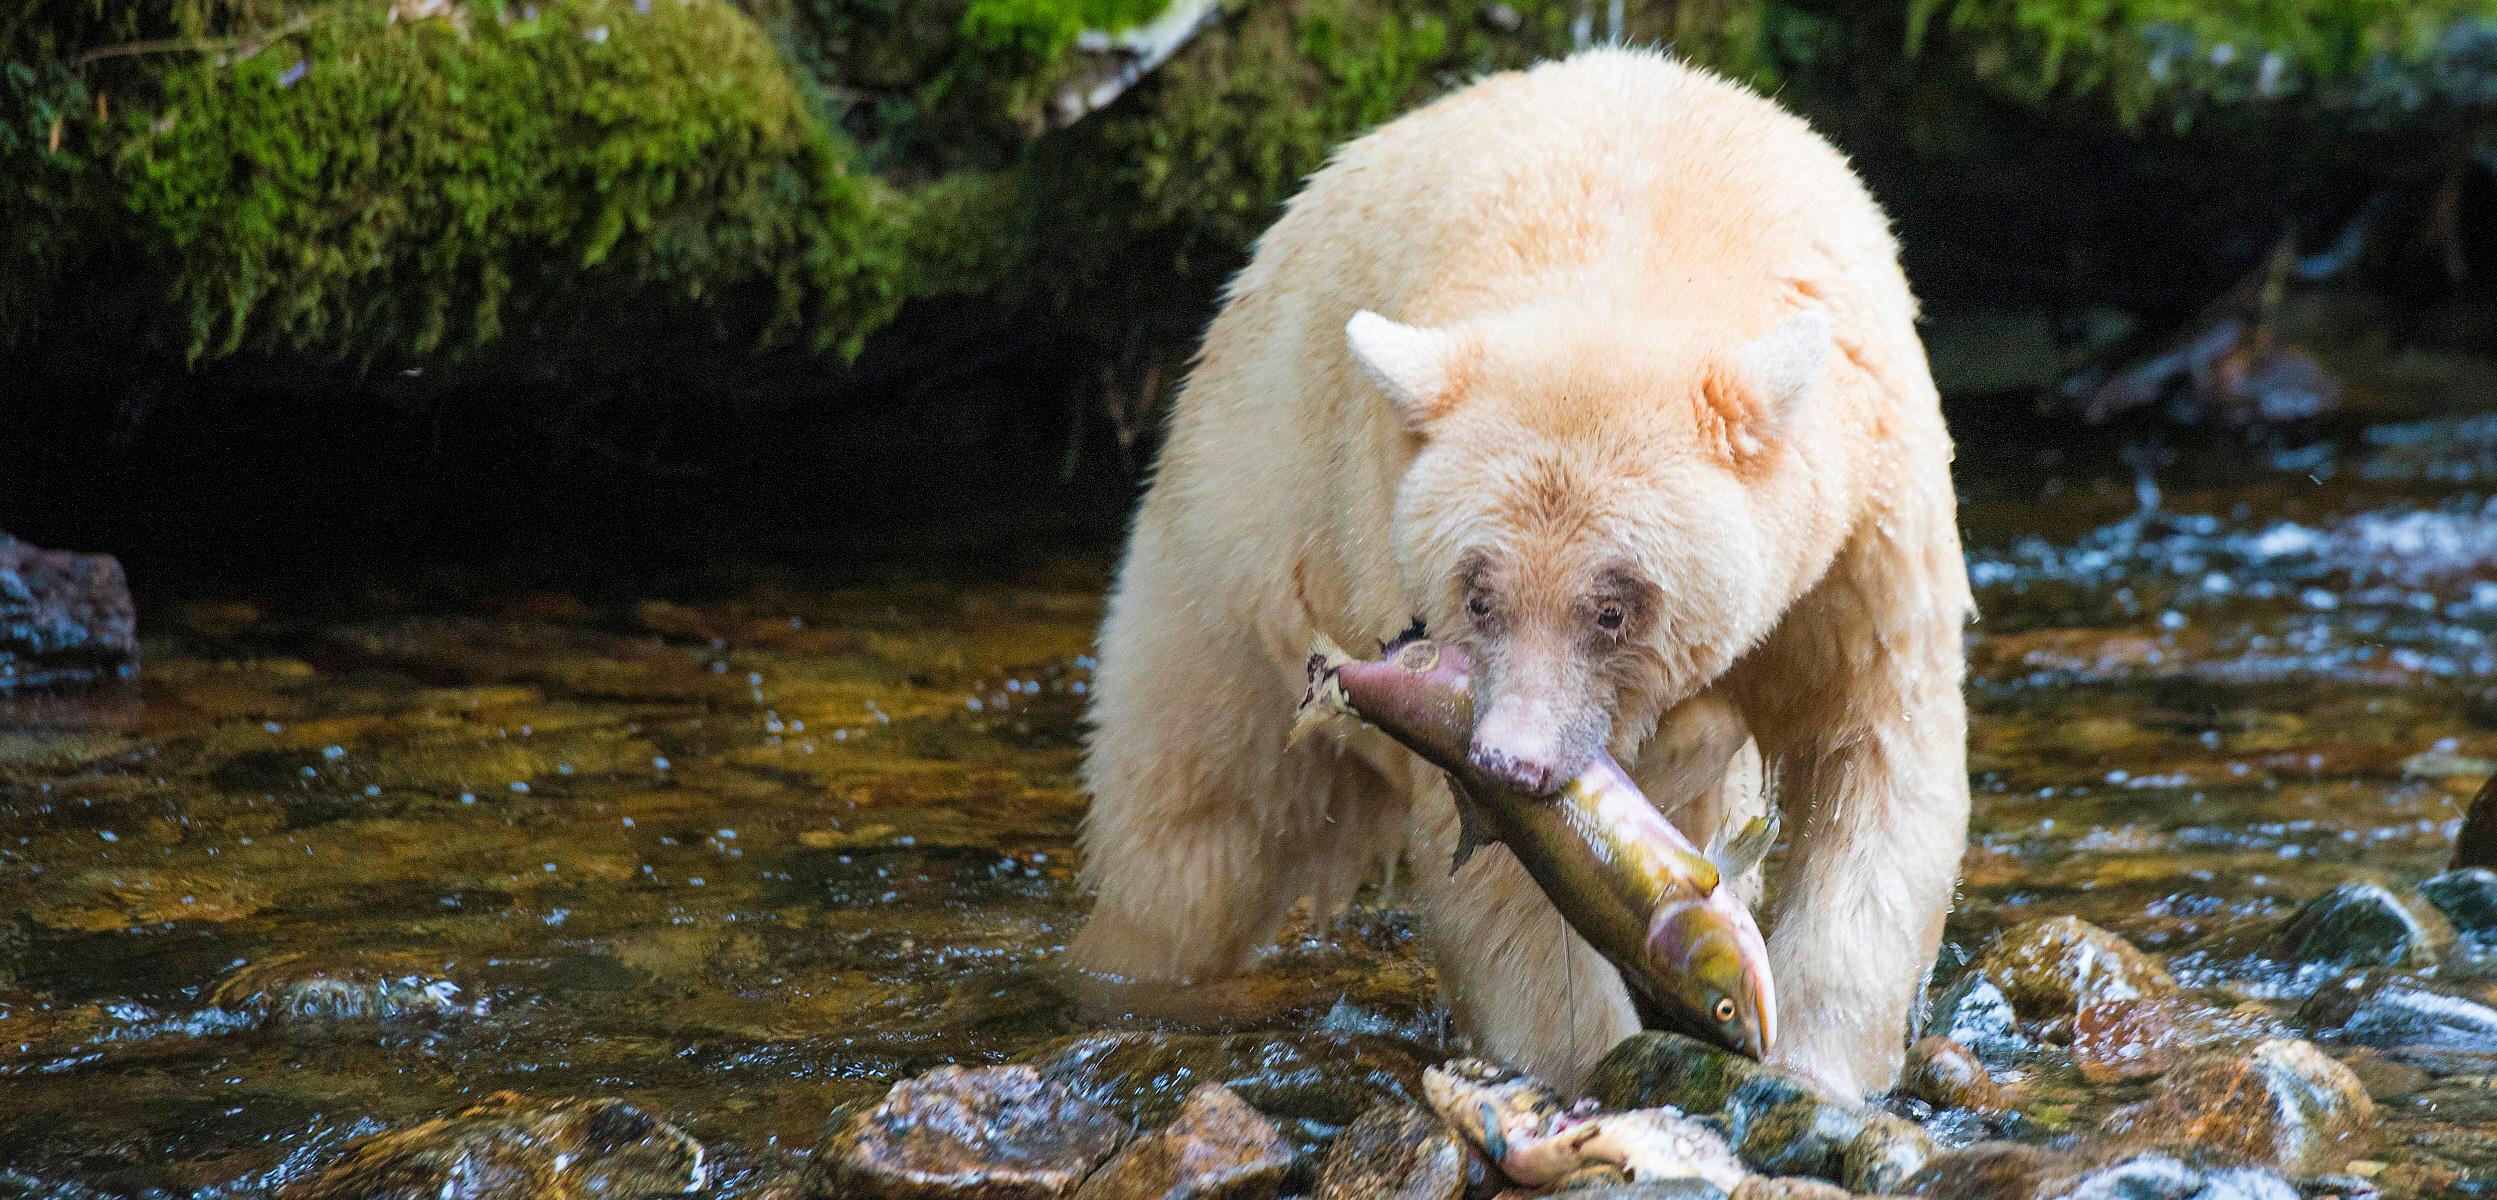 sprit bear with salmon